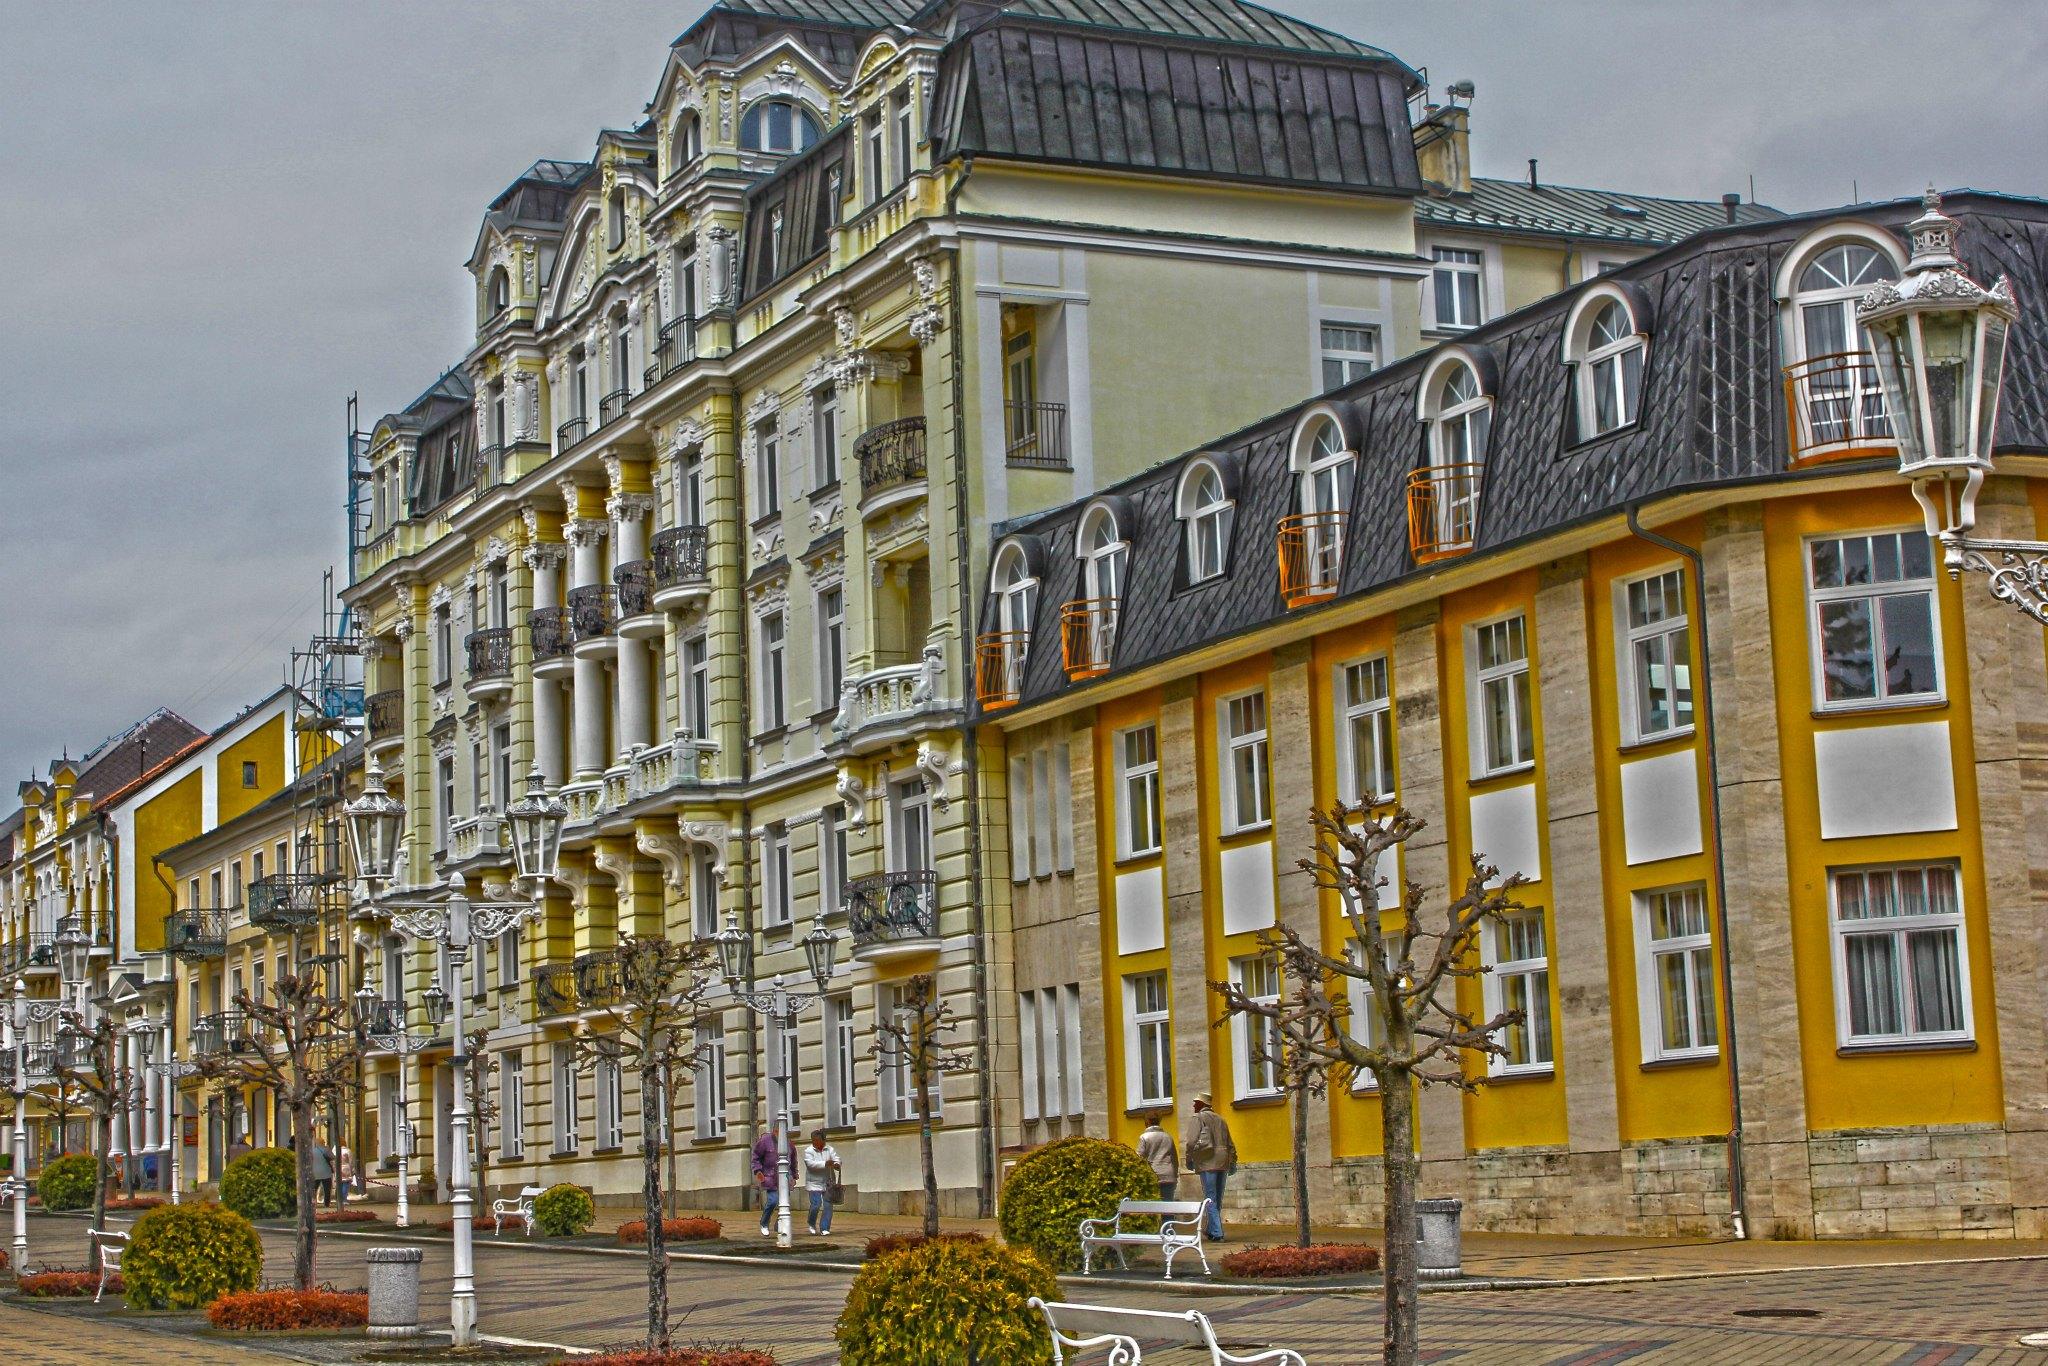 Kurhaus Kijev – Franzensbad HDR